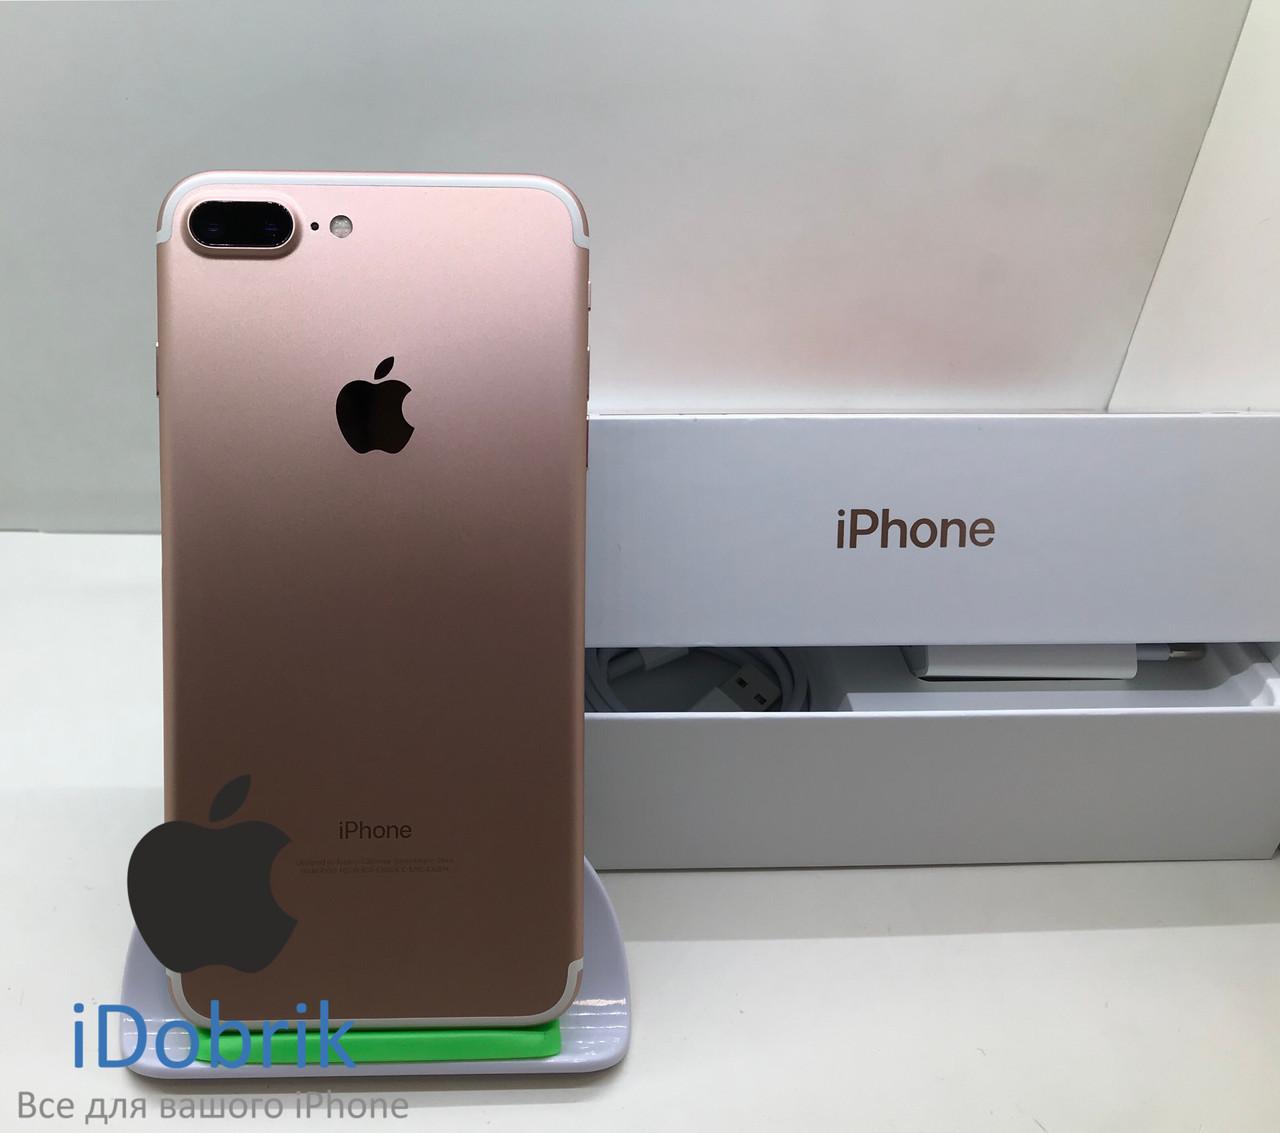 Б/У iPhone 7 Plus 128gb Rose Gold Neverlock 10/10